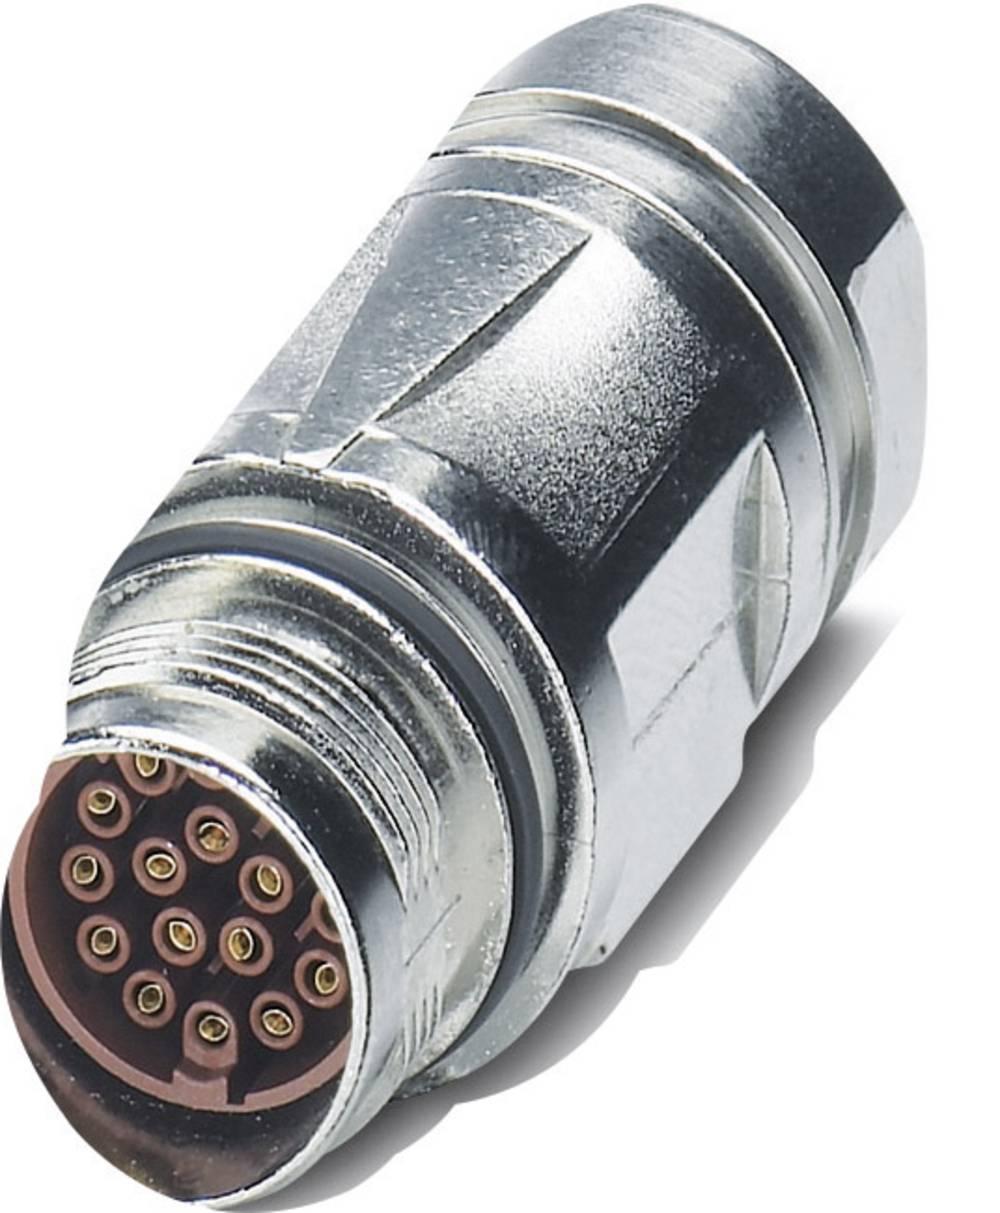 M17-kobling stik Phoenix Contact ST-17S1N8A9005S Sølv 1 stk